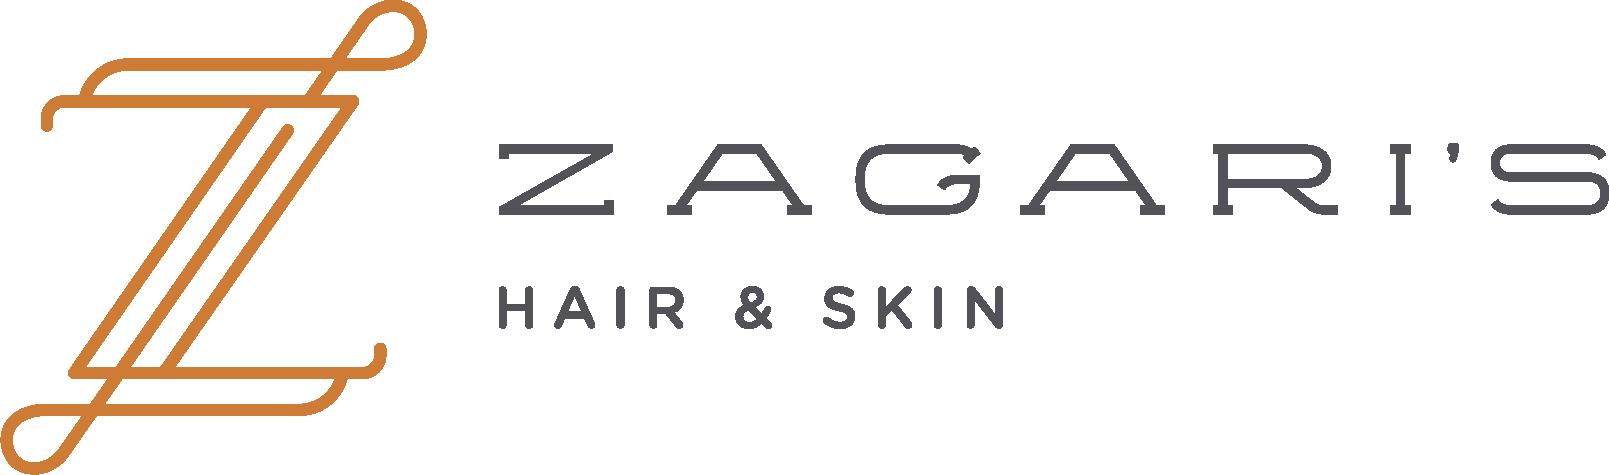 Zagaris Hair Dresser